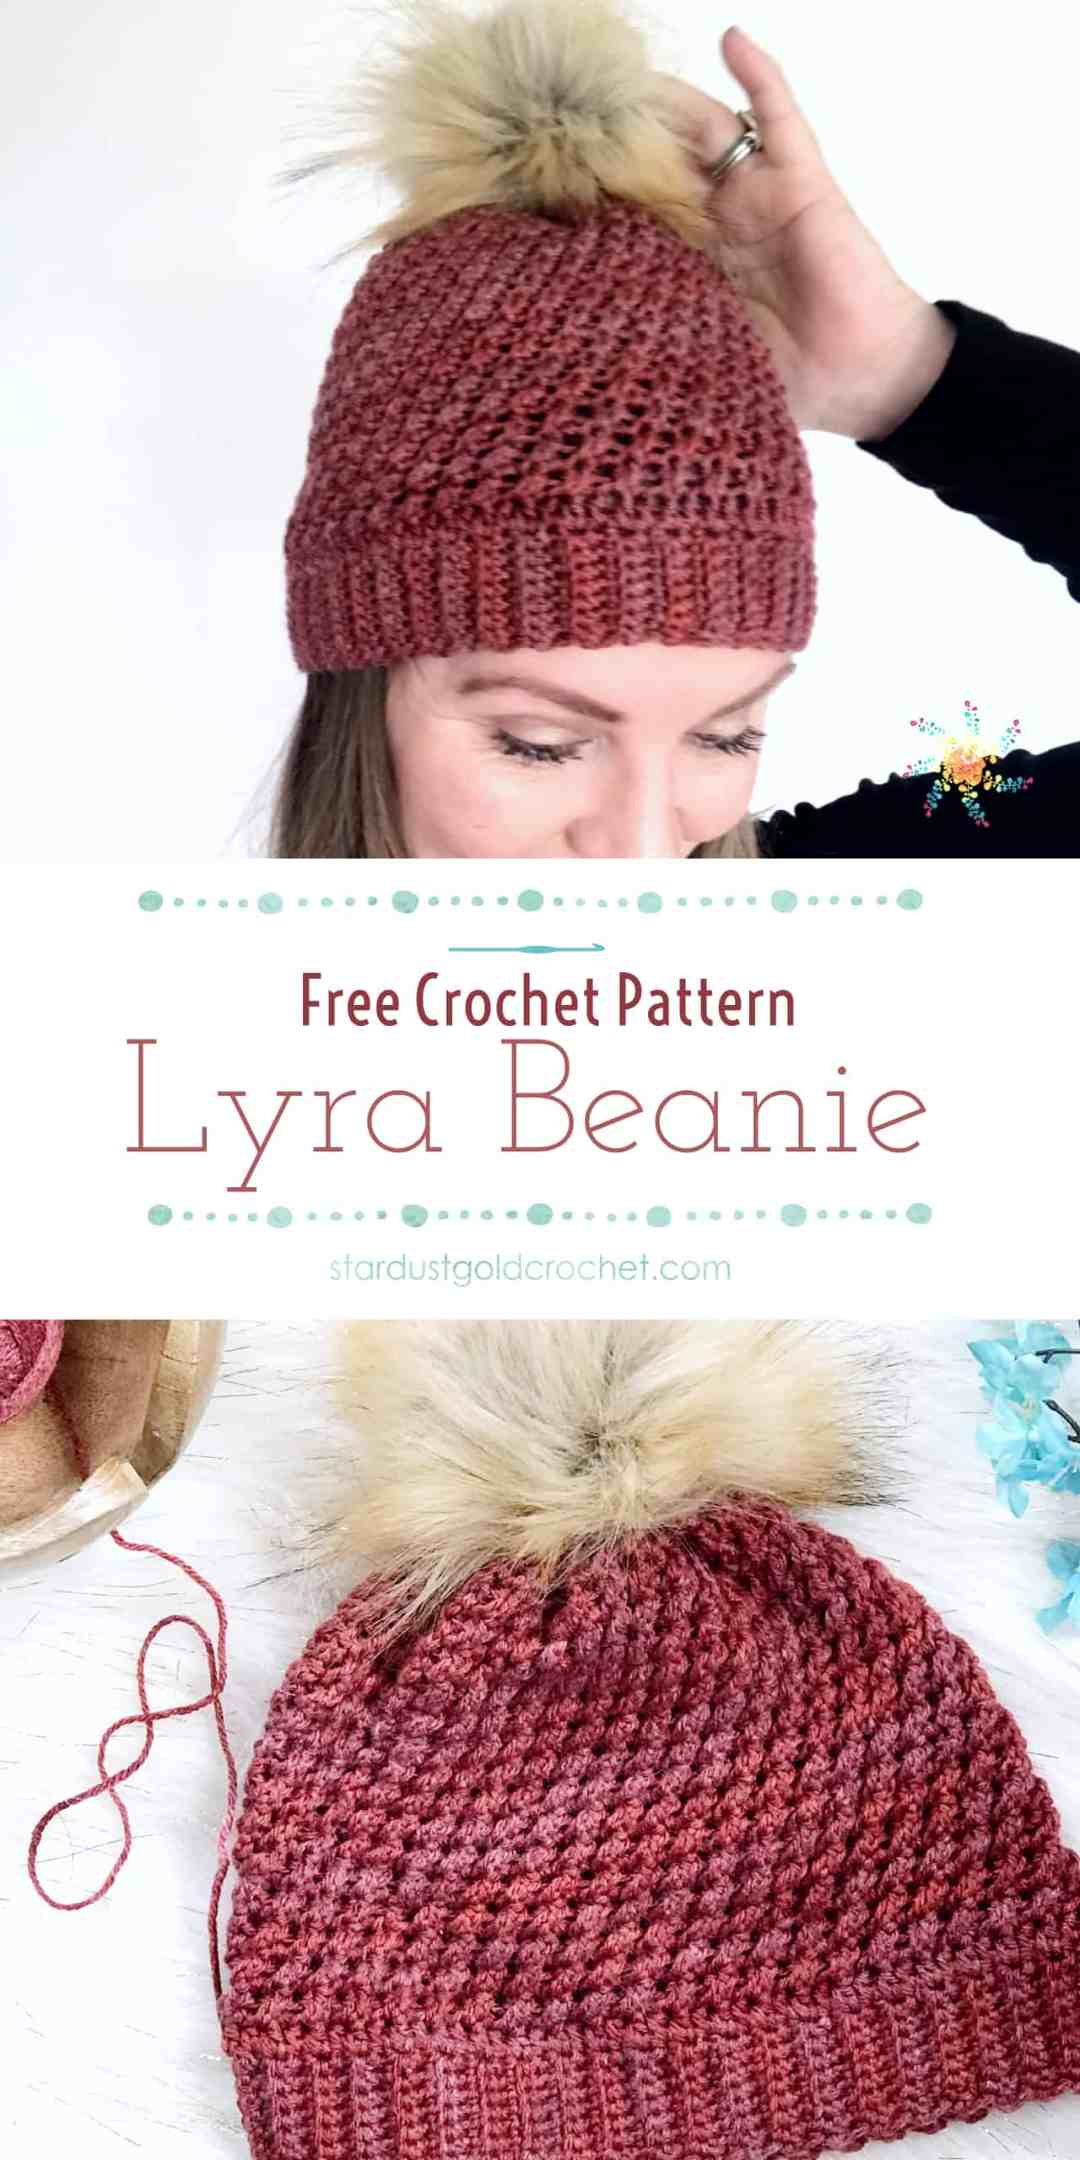 Lyra Beanie Pin